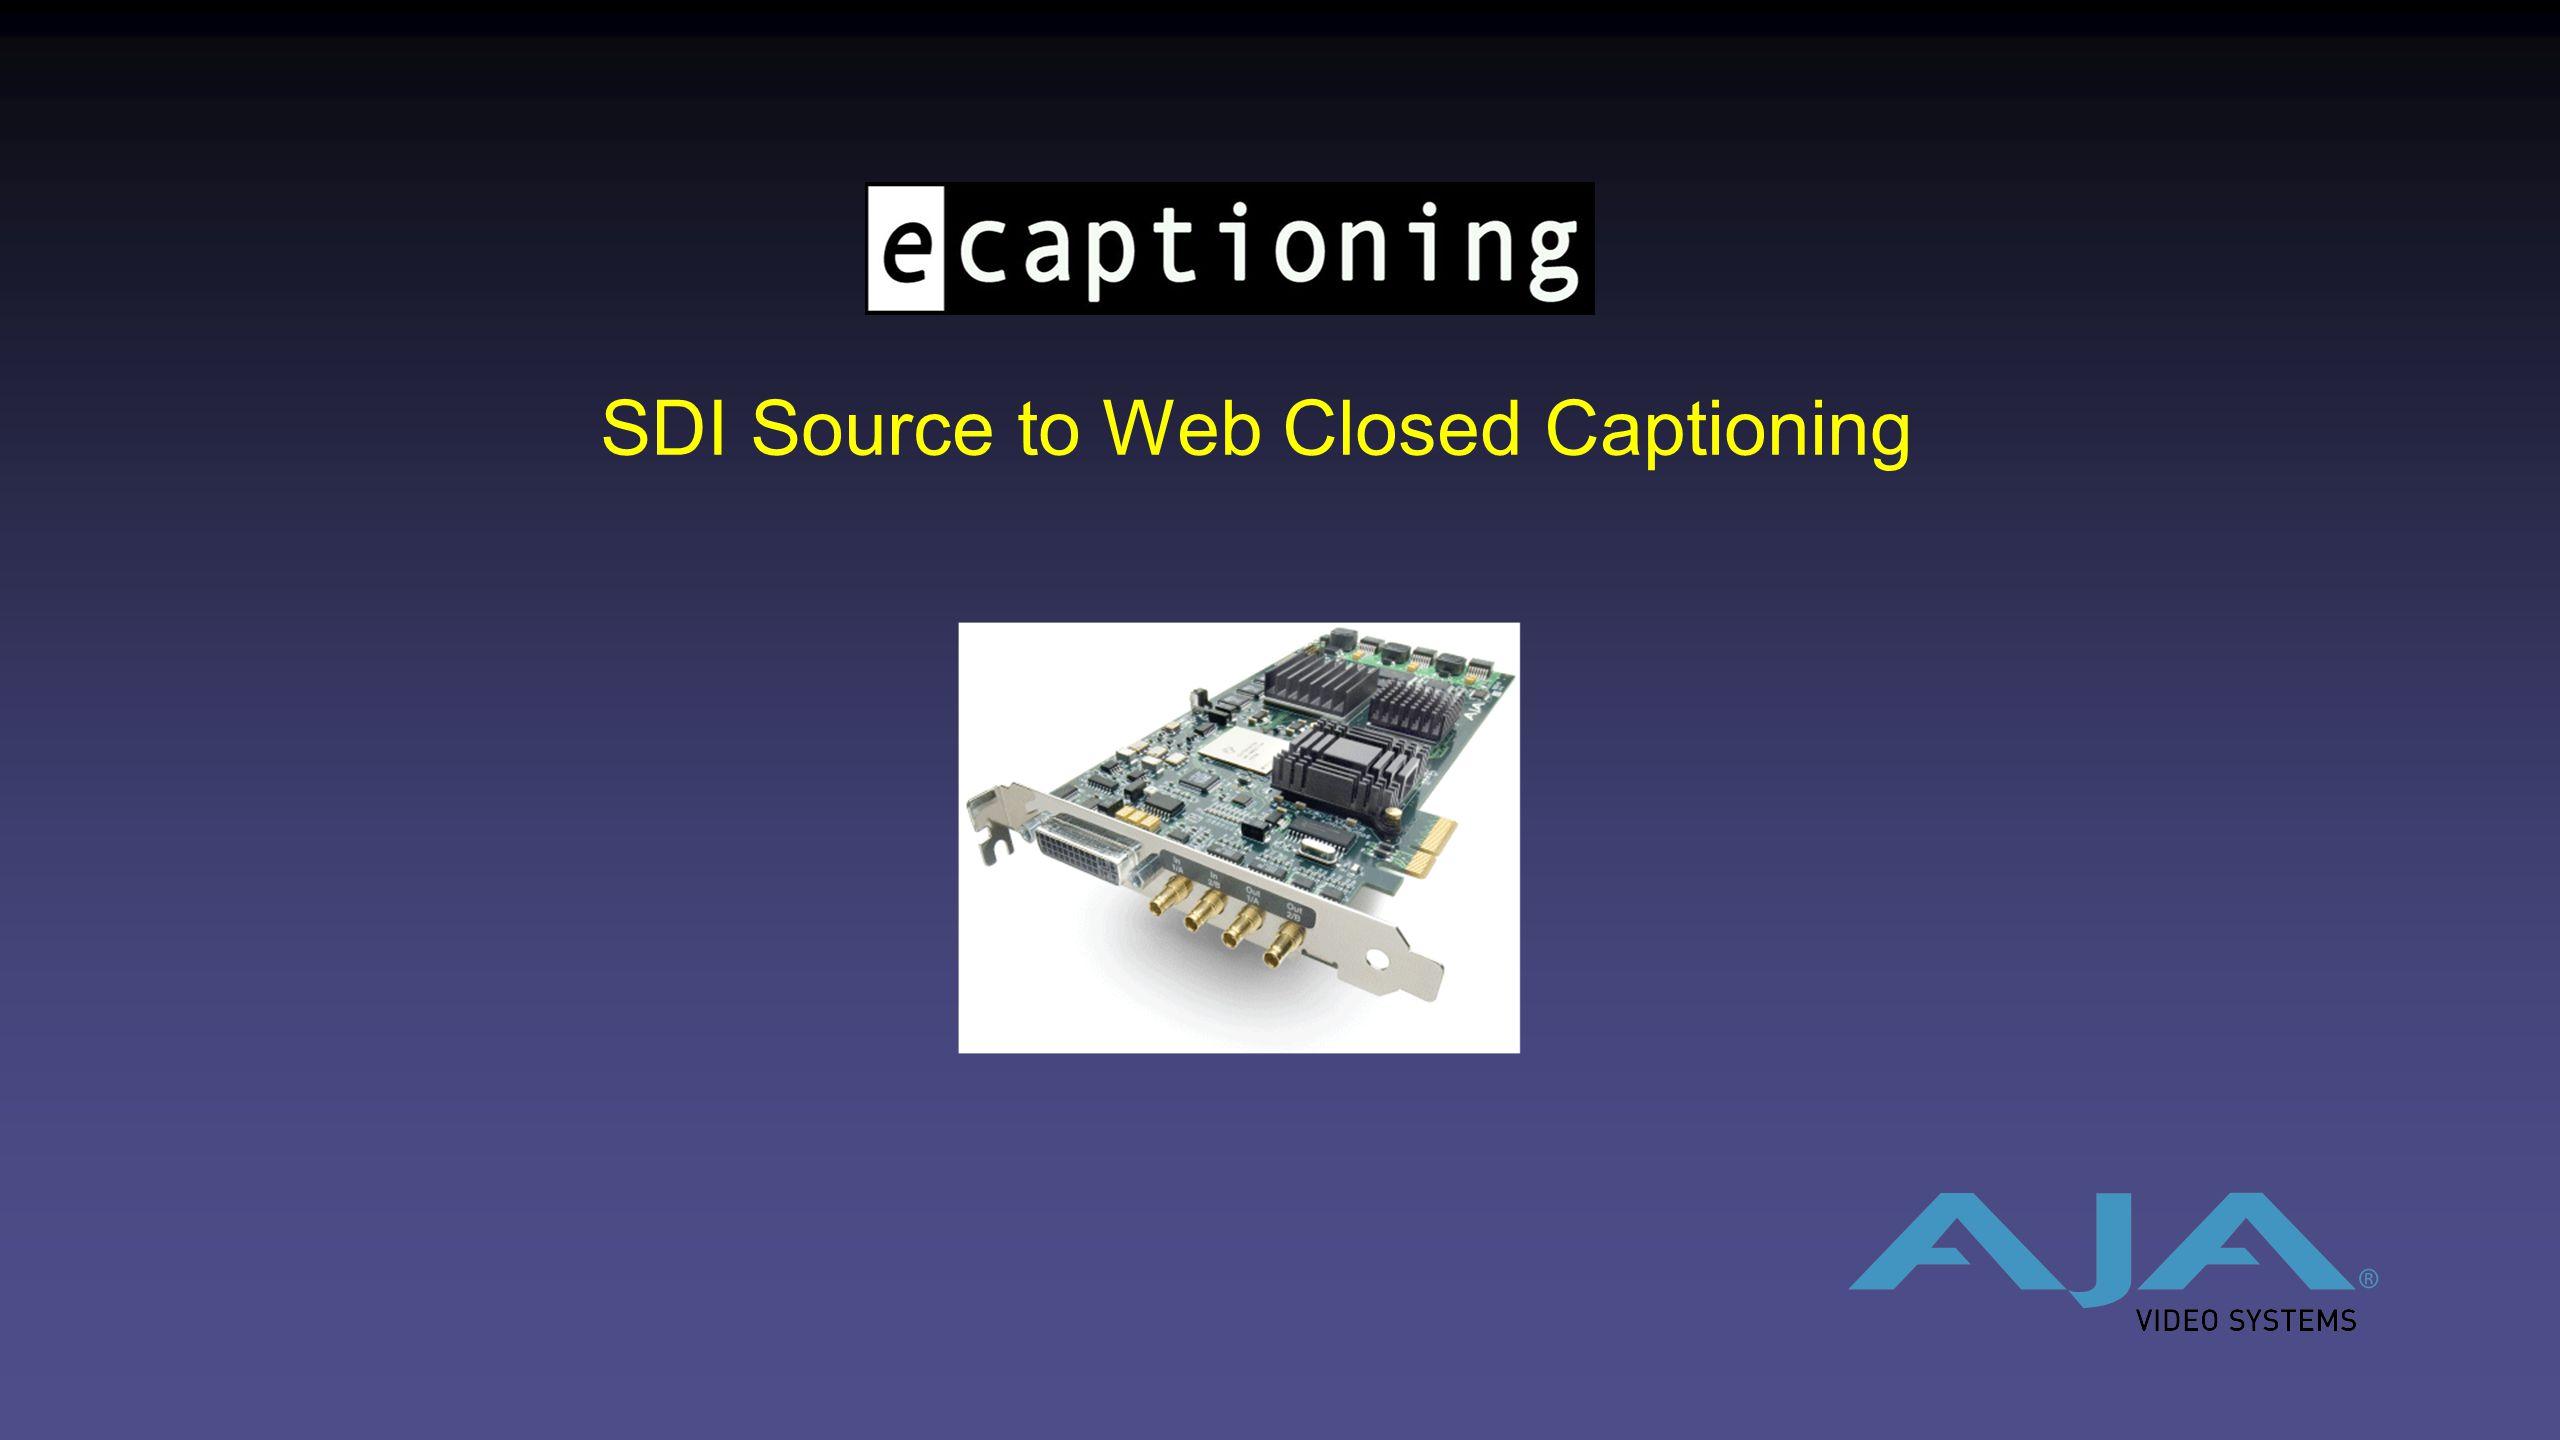 SDI Source to Web Closed Captioning